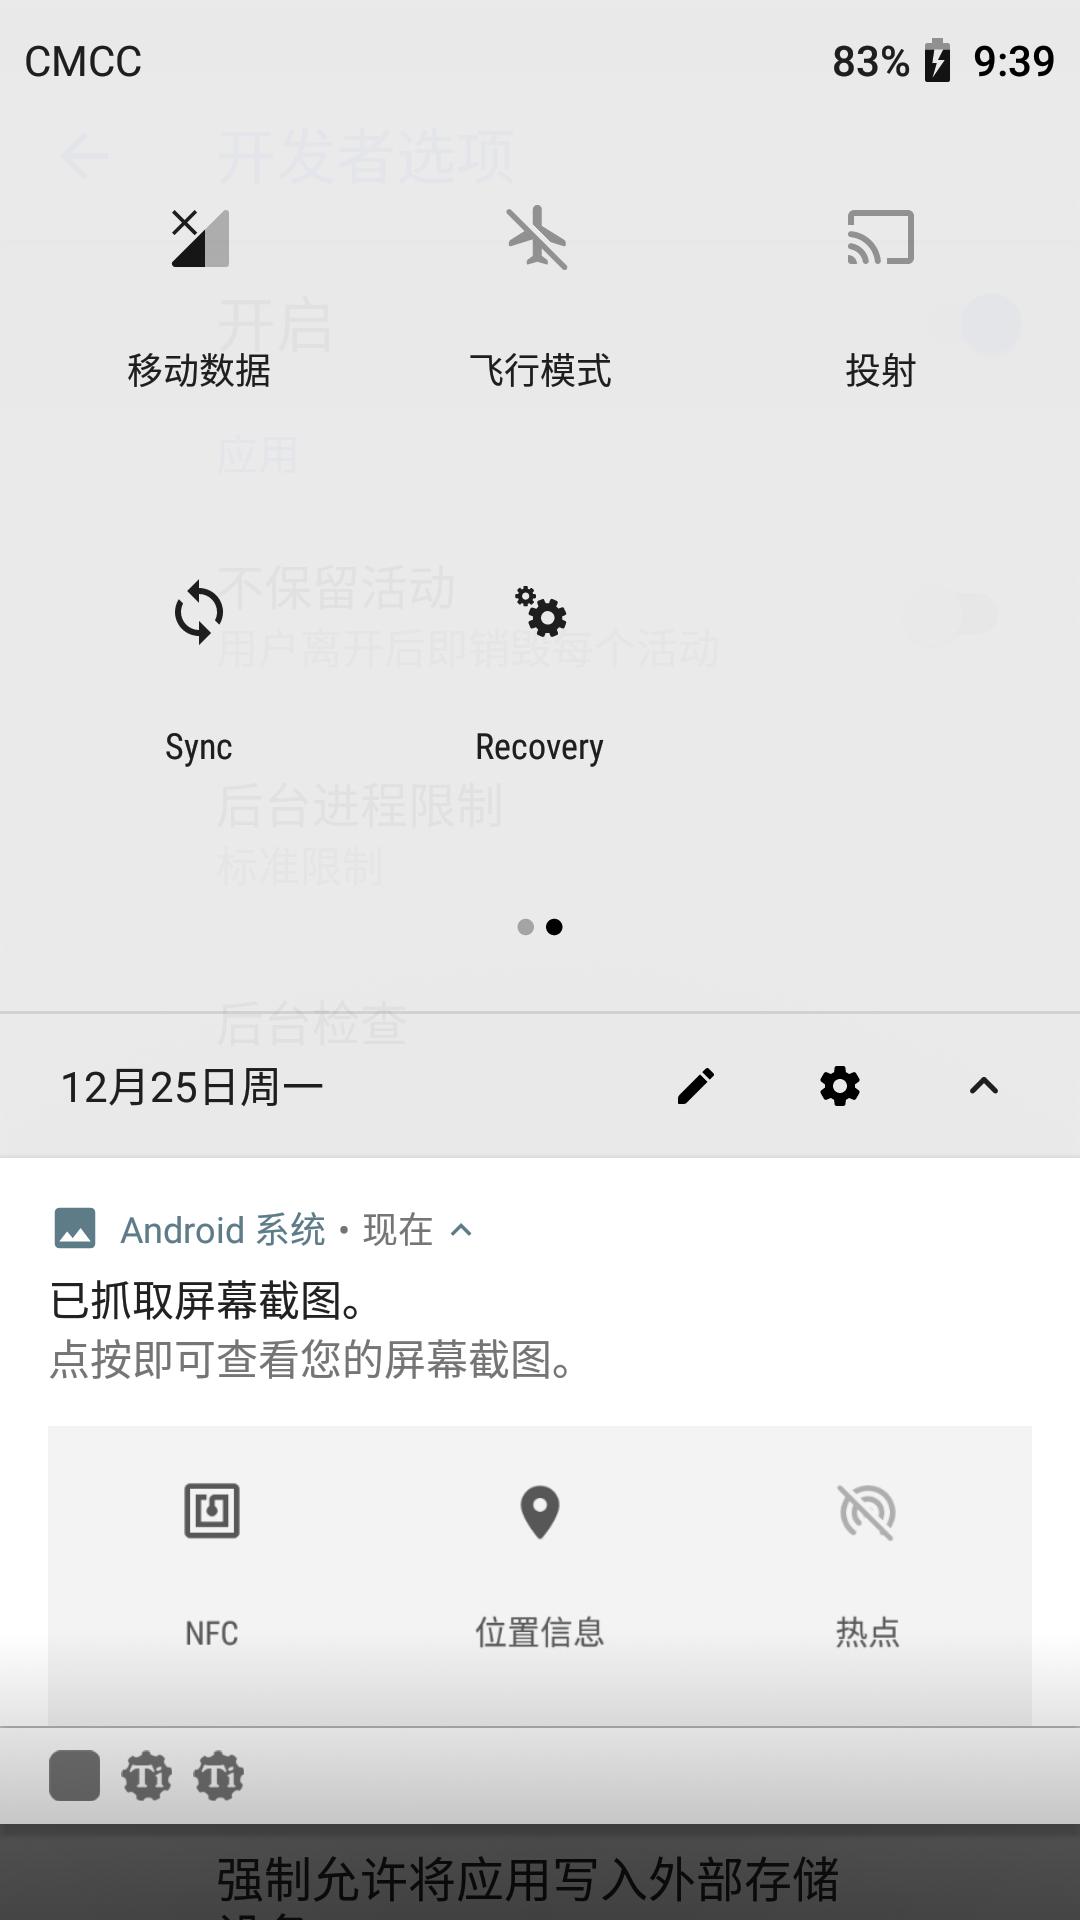 Screenshot_20171225-093957.png